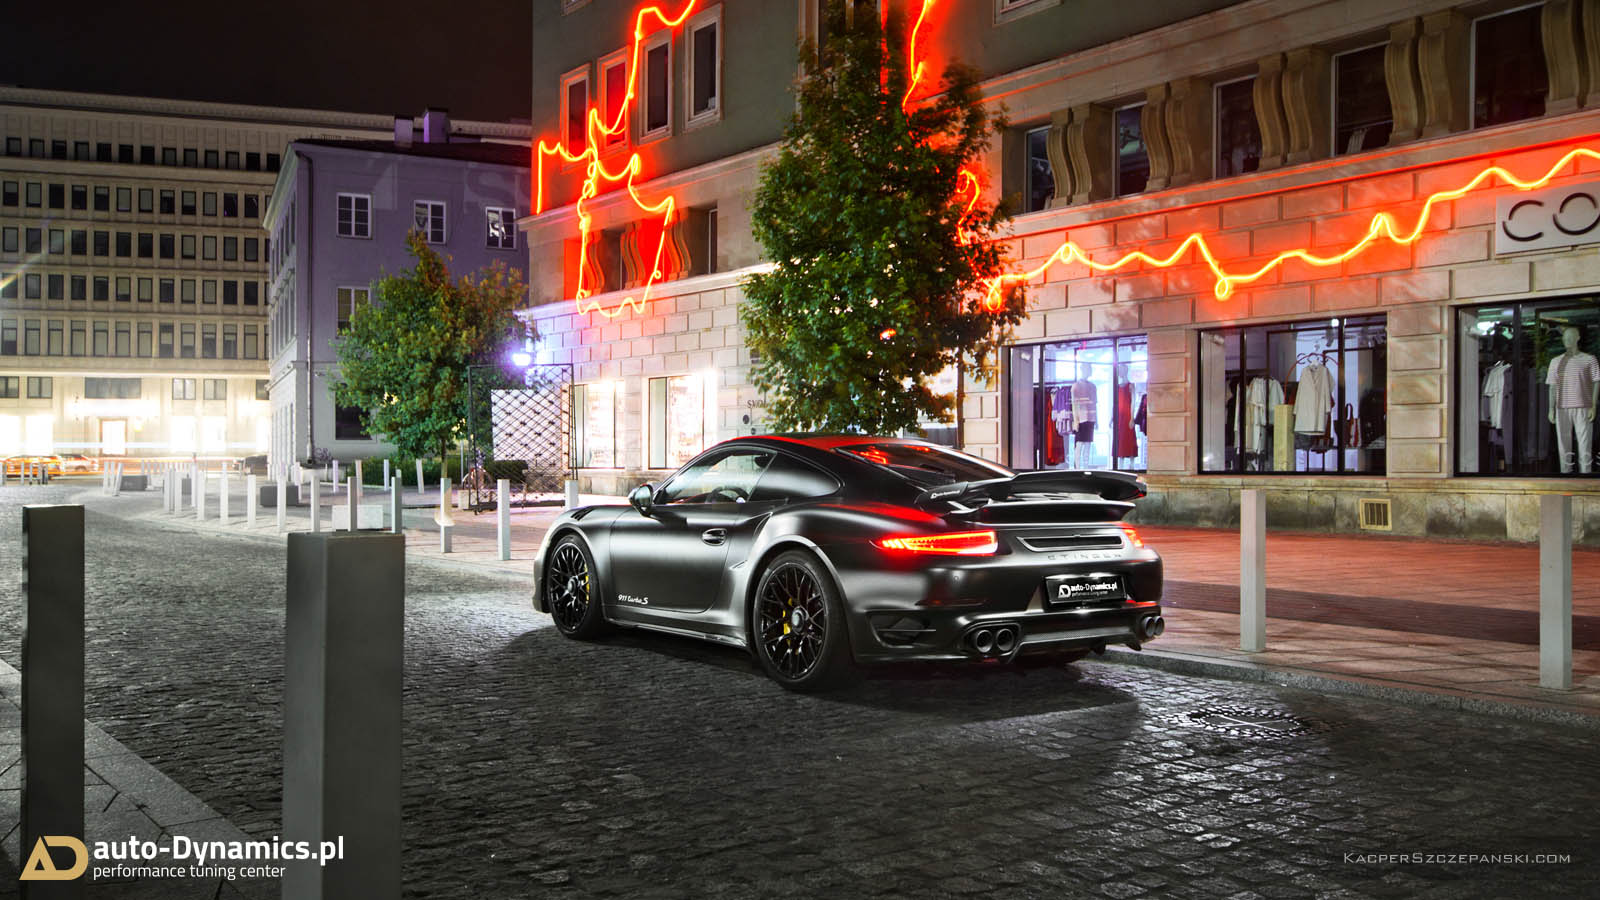 Porsche 911 Turbo S by Auto-Dynamics (2)